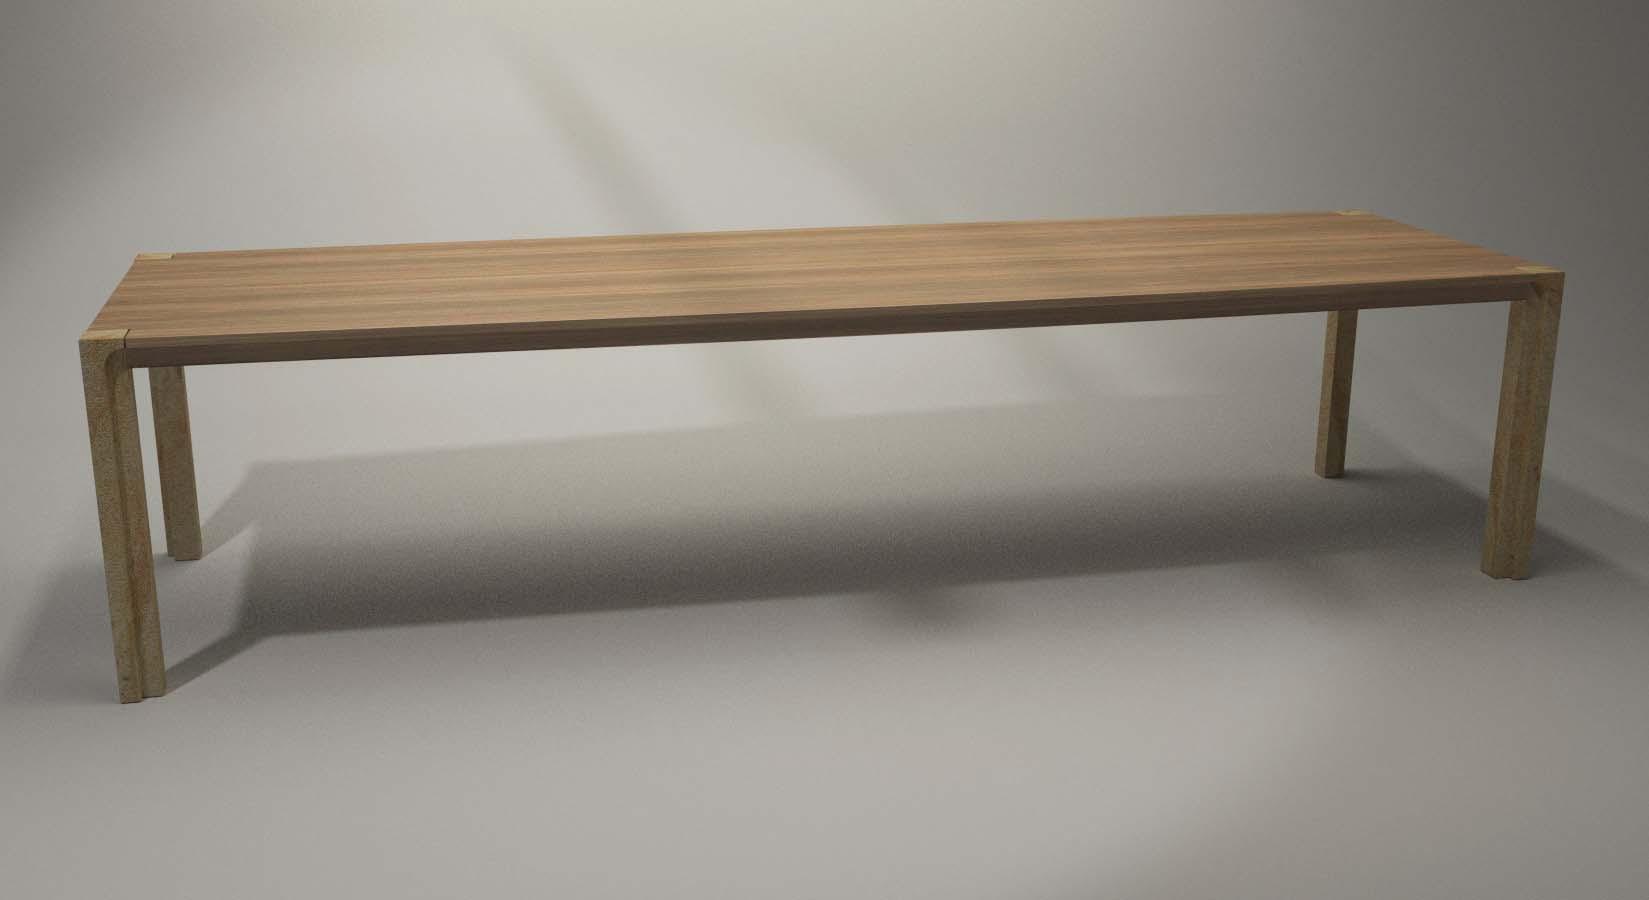 Design Tisch Cosel Nummer 1 aus Sandstein Massiv-Holz by Sebastian Bohry